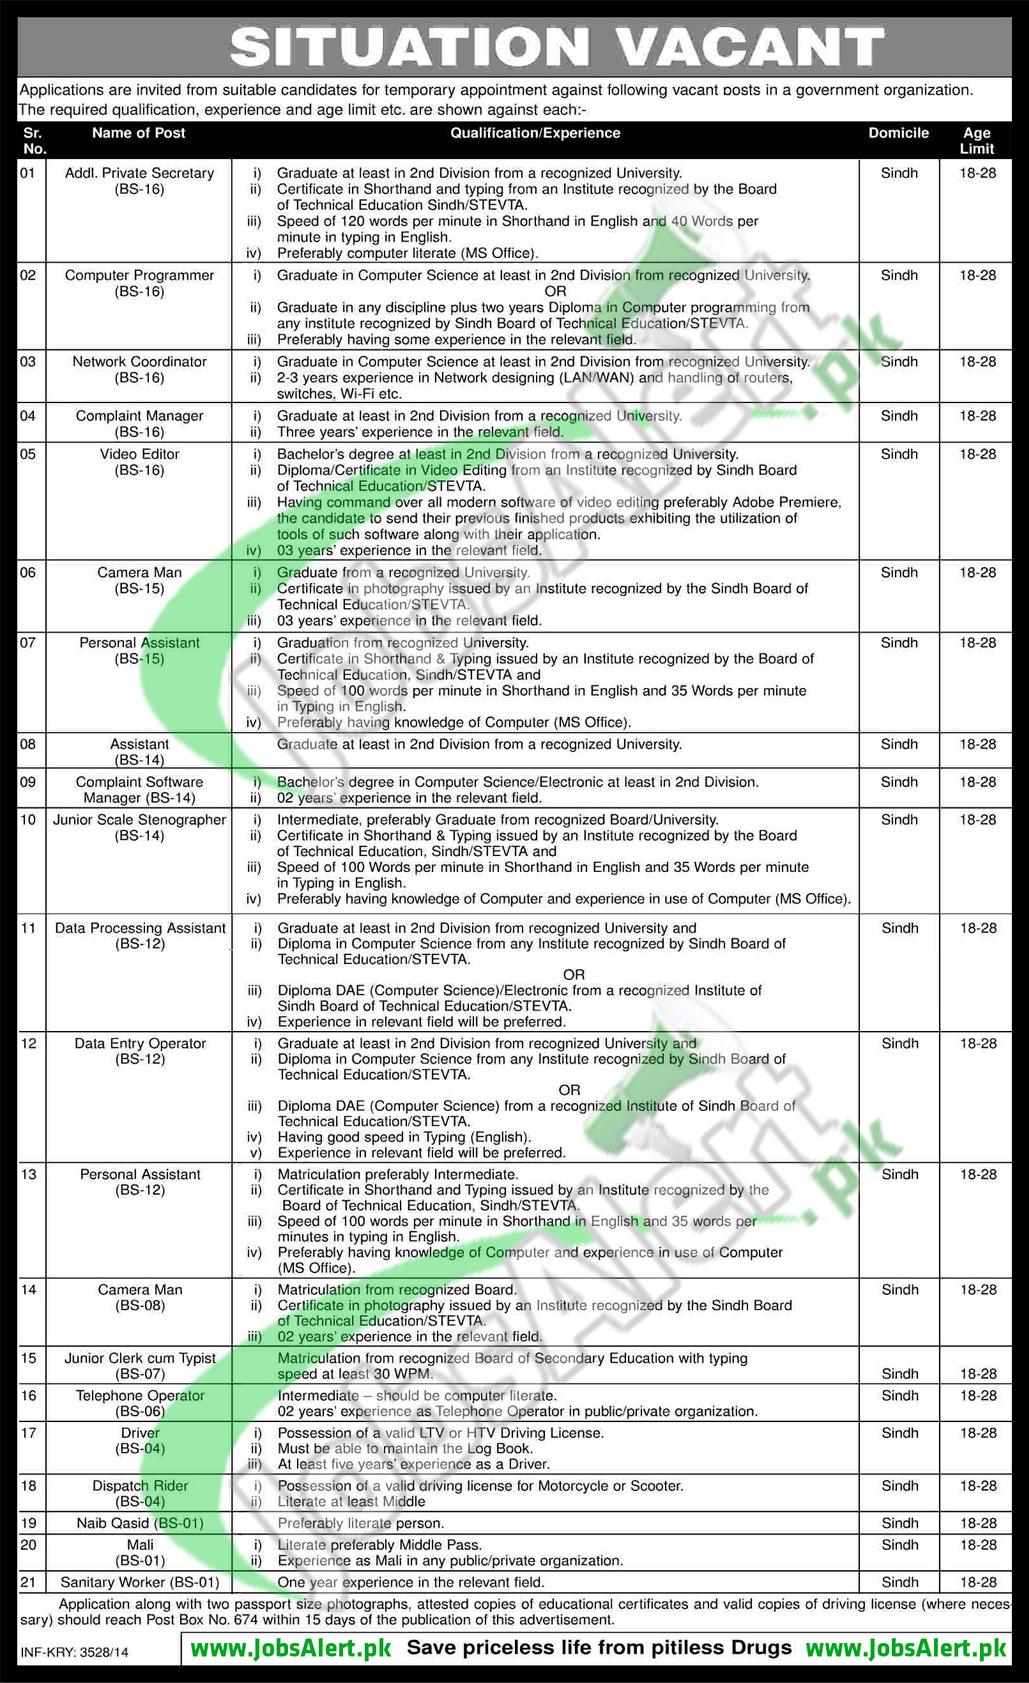 Sindh Government Organization Jobs Opportunities 2014